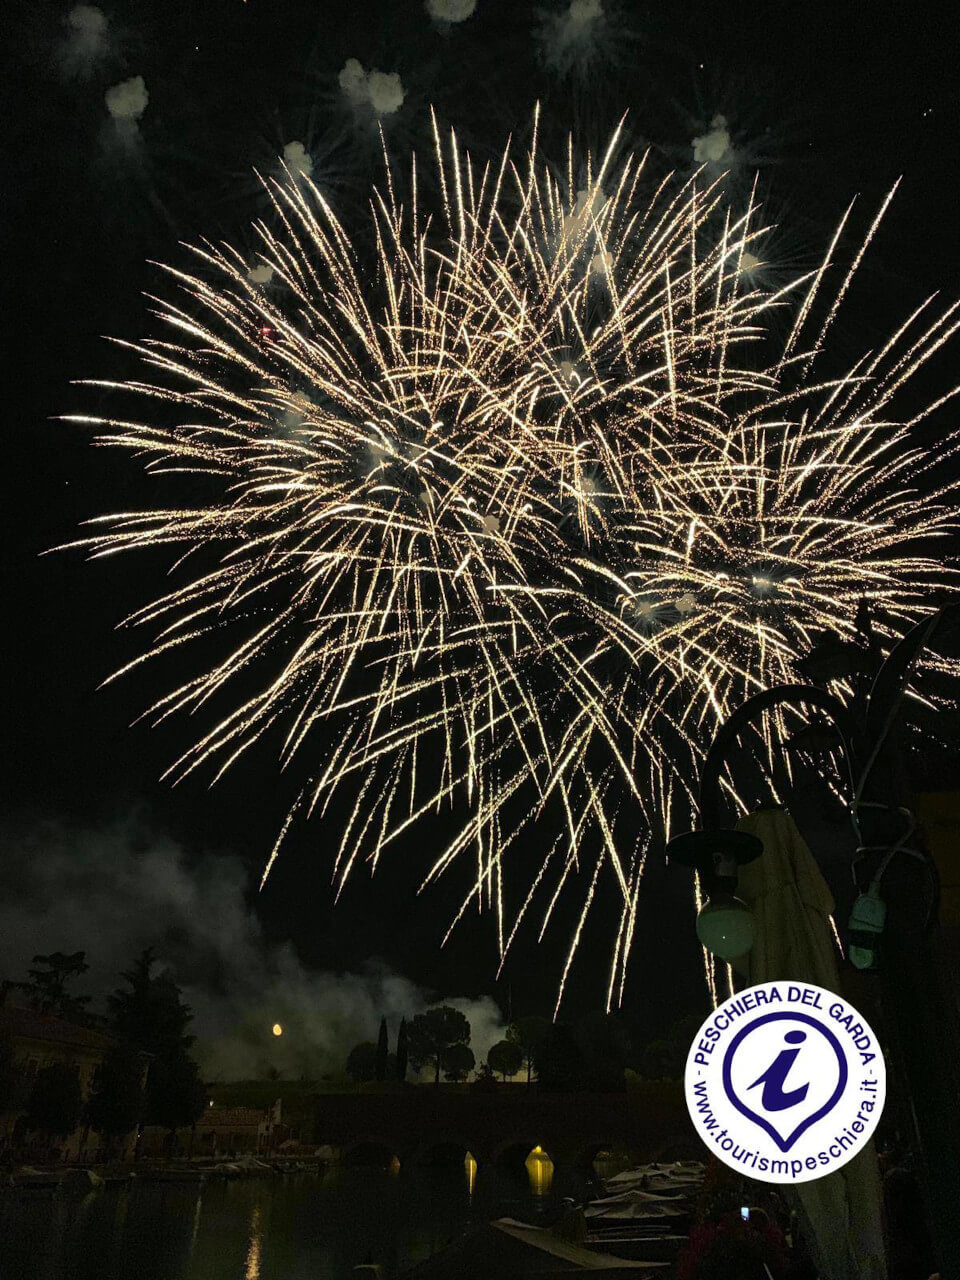 Veranstaltungen in Peschiera del Garda